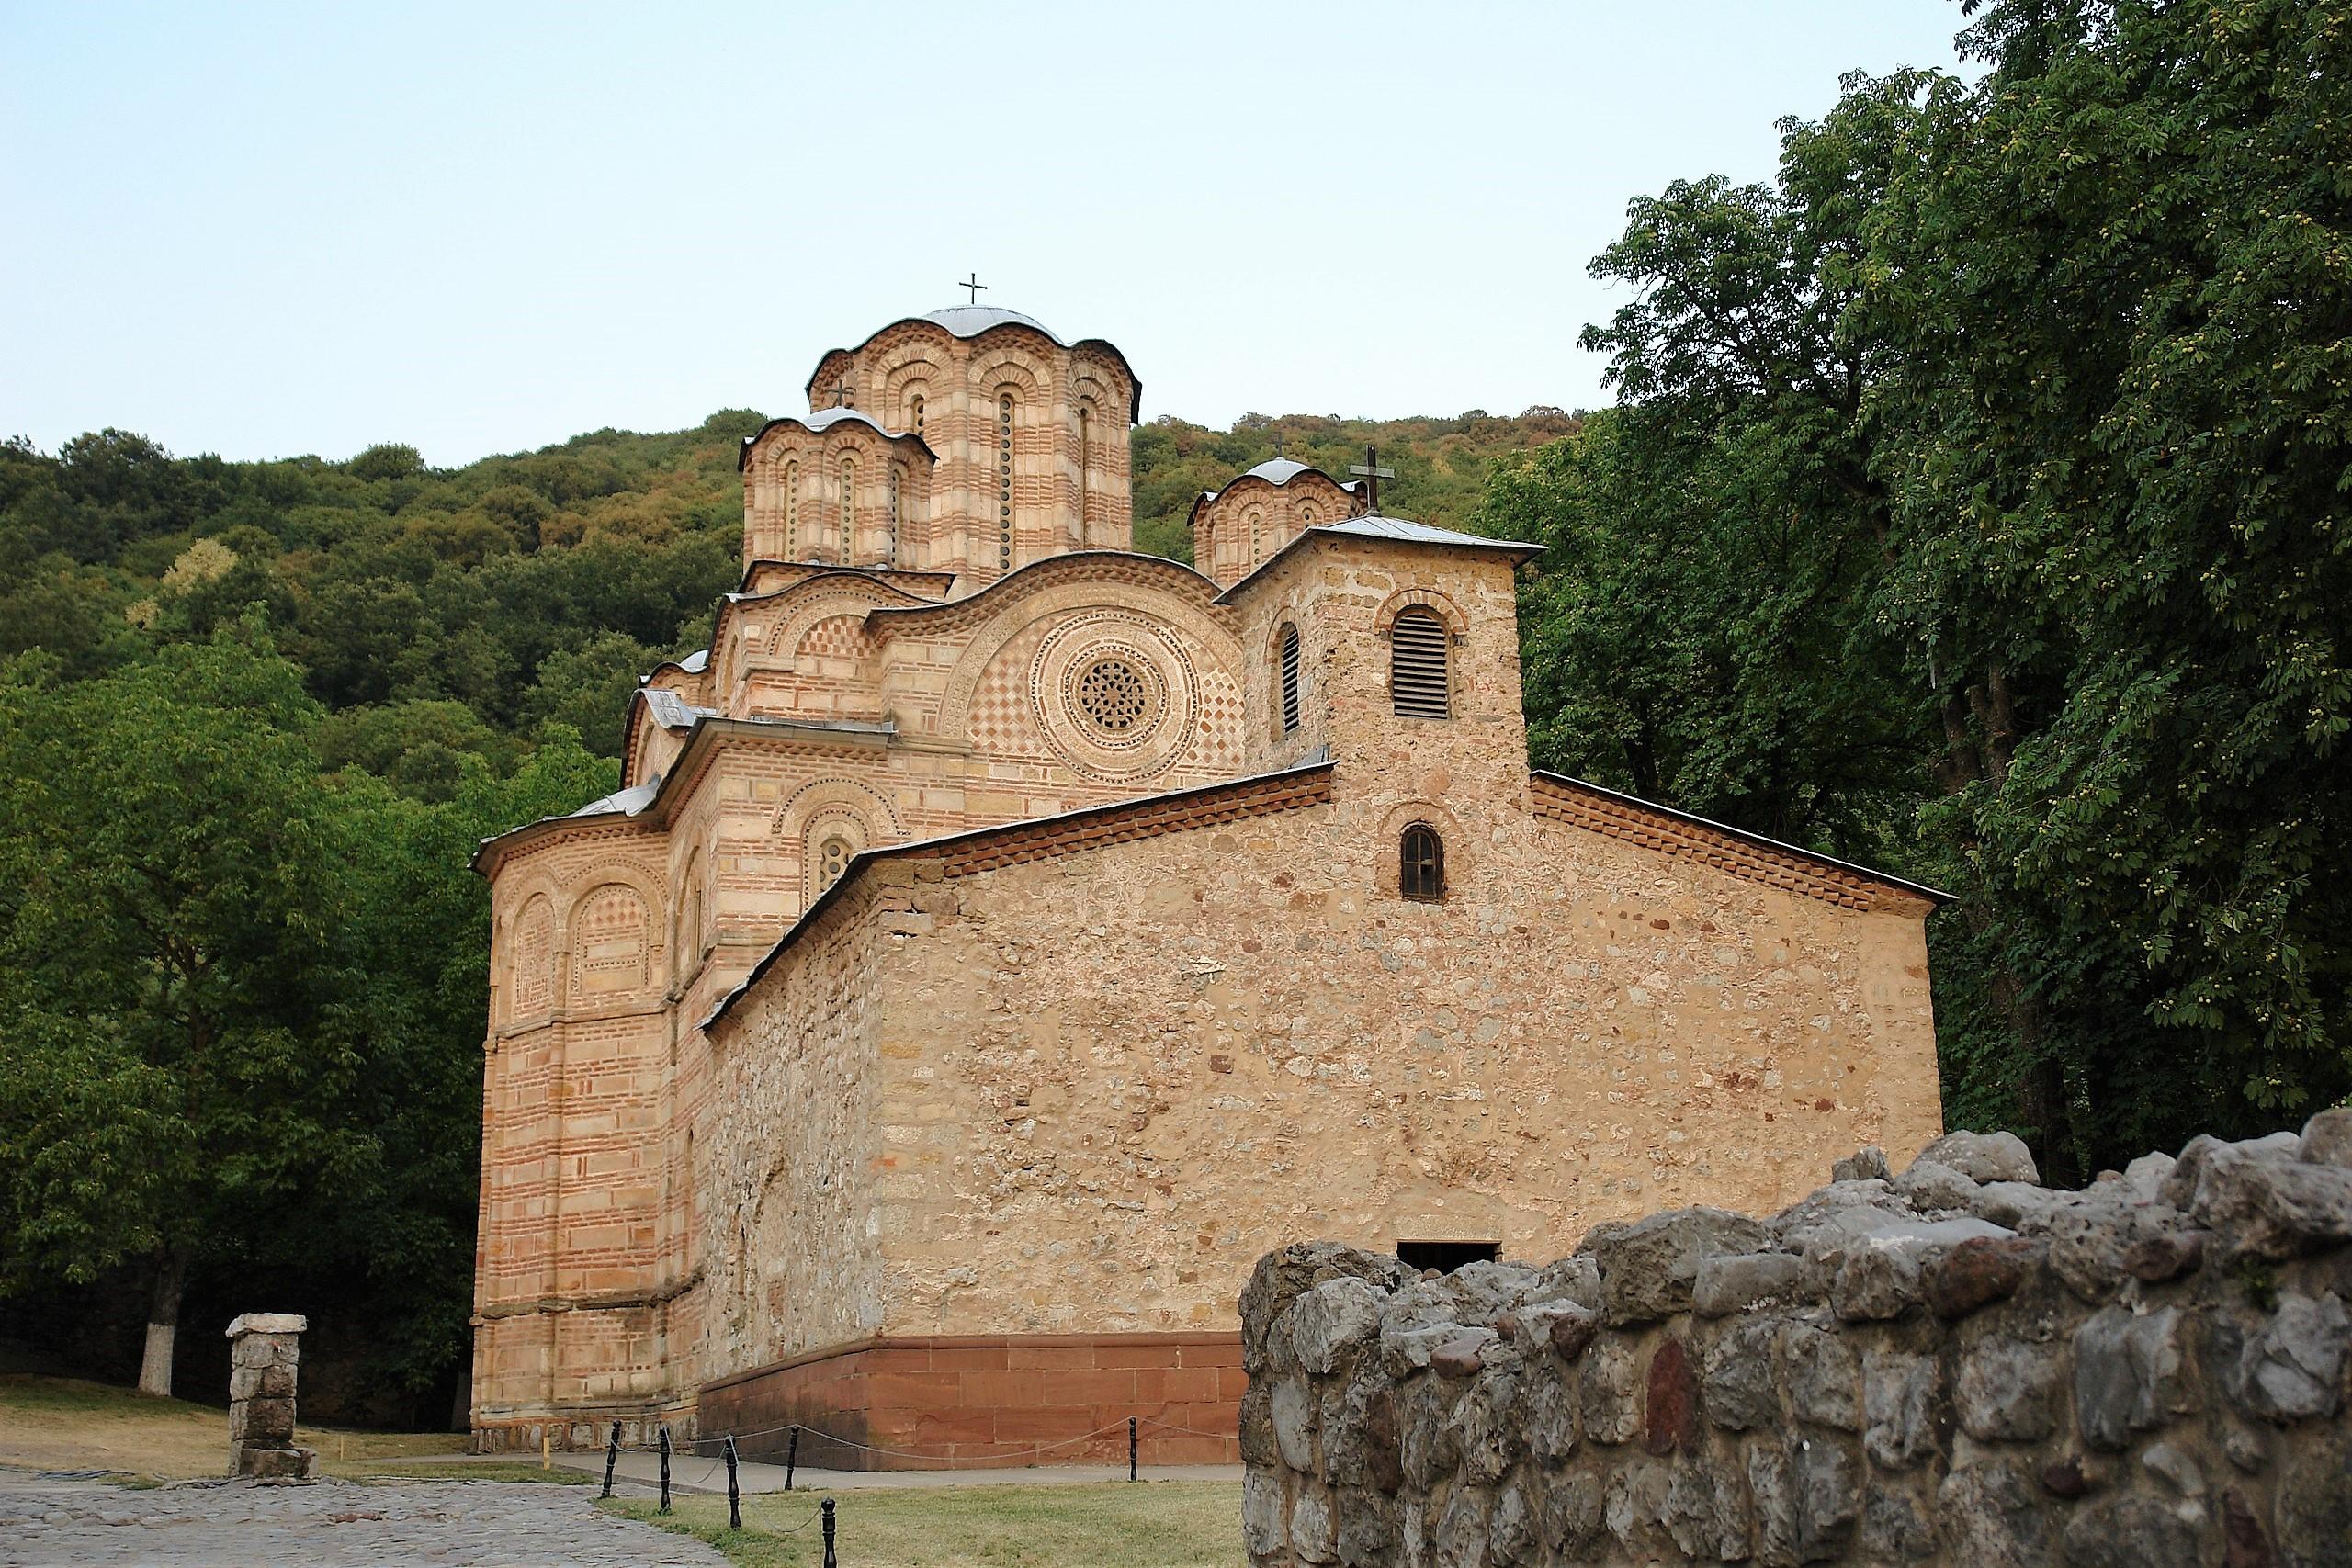 Manastiri resavskog kraja, Resavska pećina